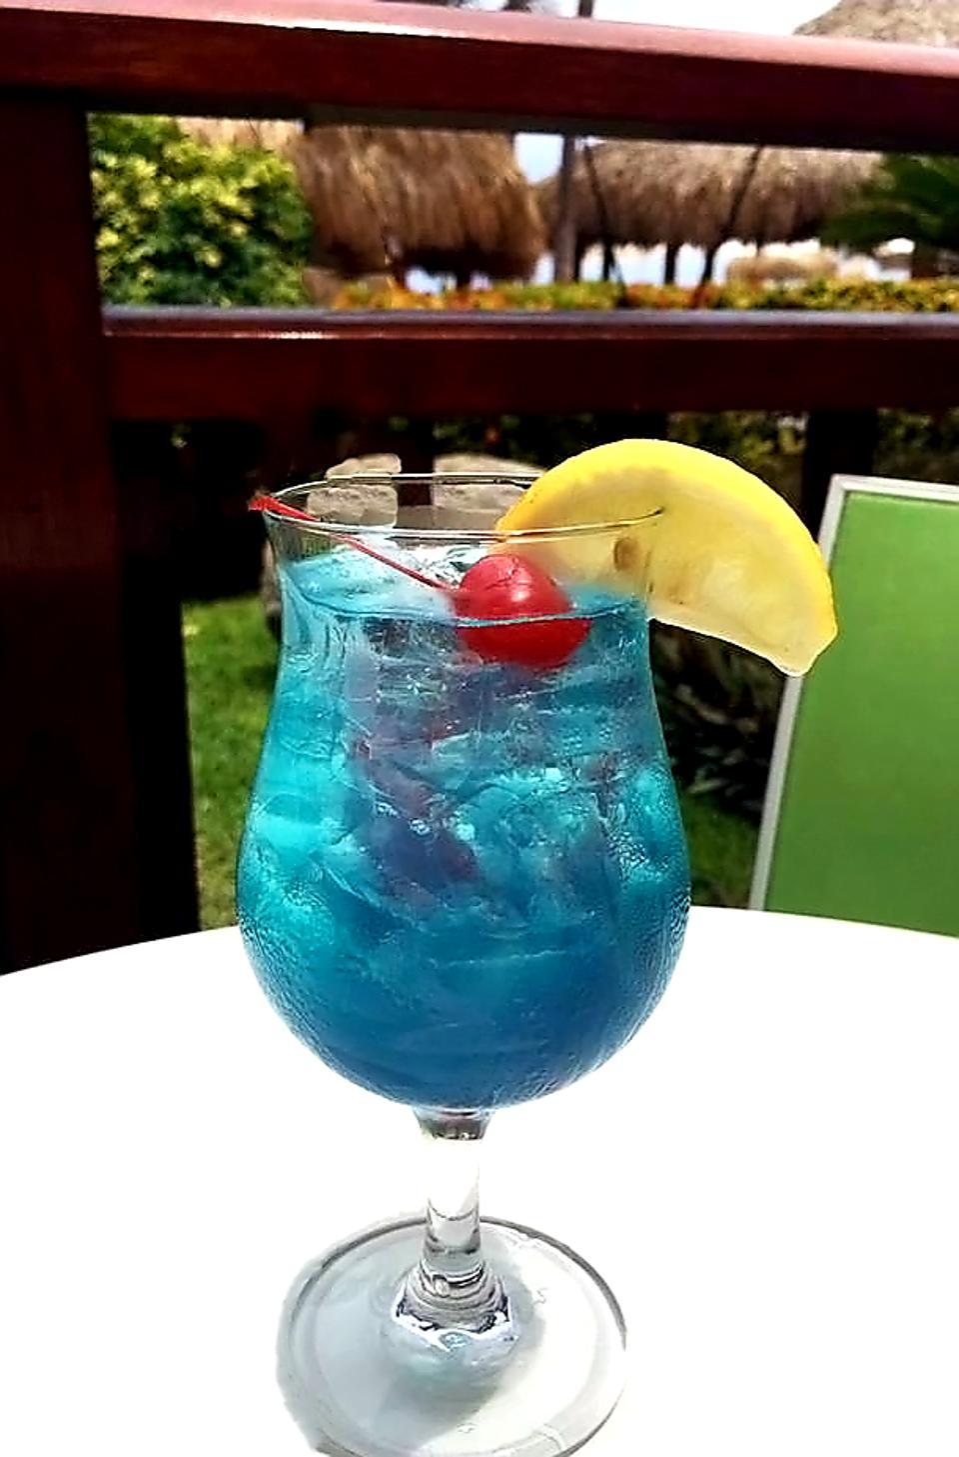 Electric Lemonade at Hyatt Regency Aruba in Aruba.